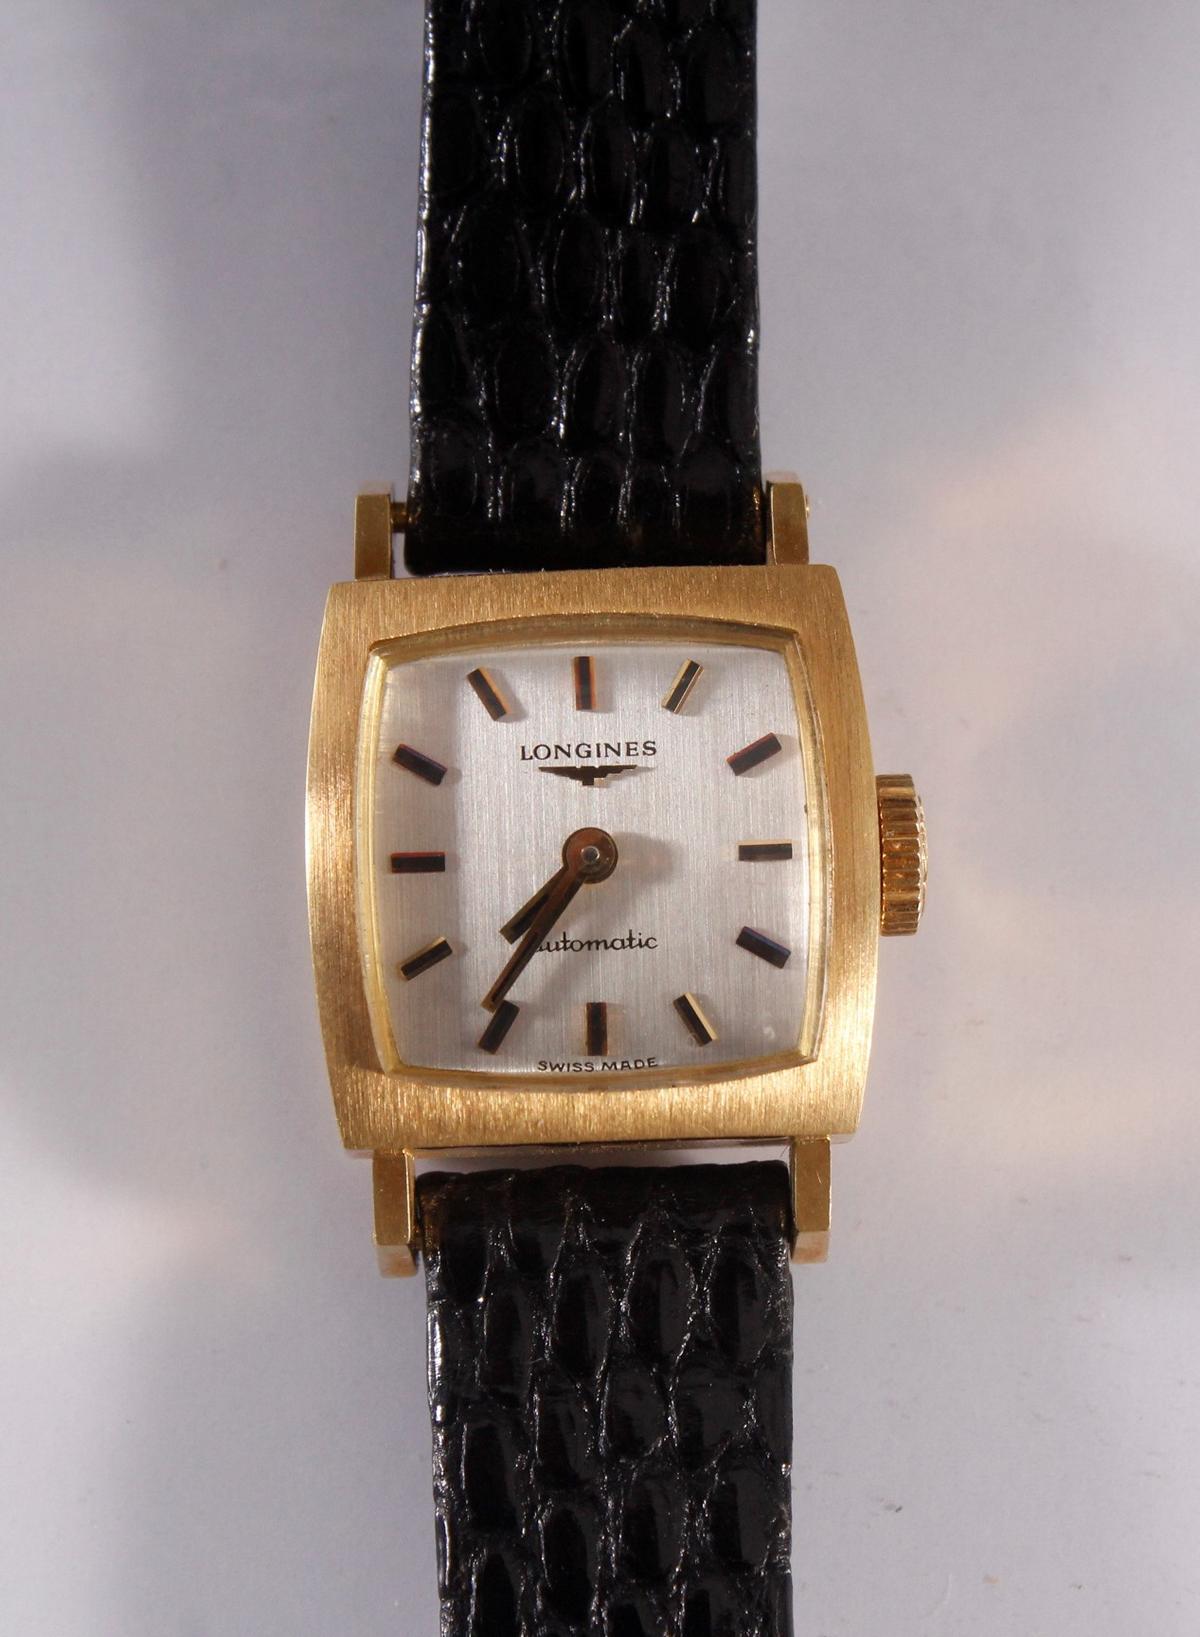 Longine Automatic Damenarmbanduhr, 18 Karat Gelbgold-2